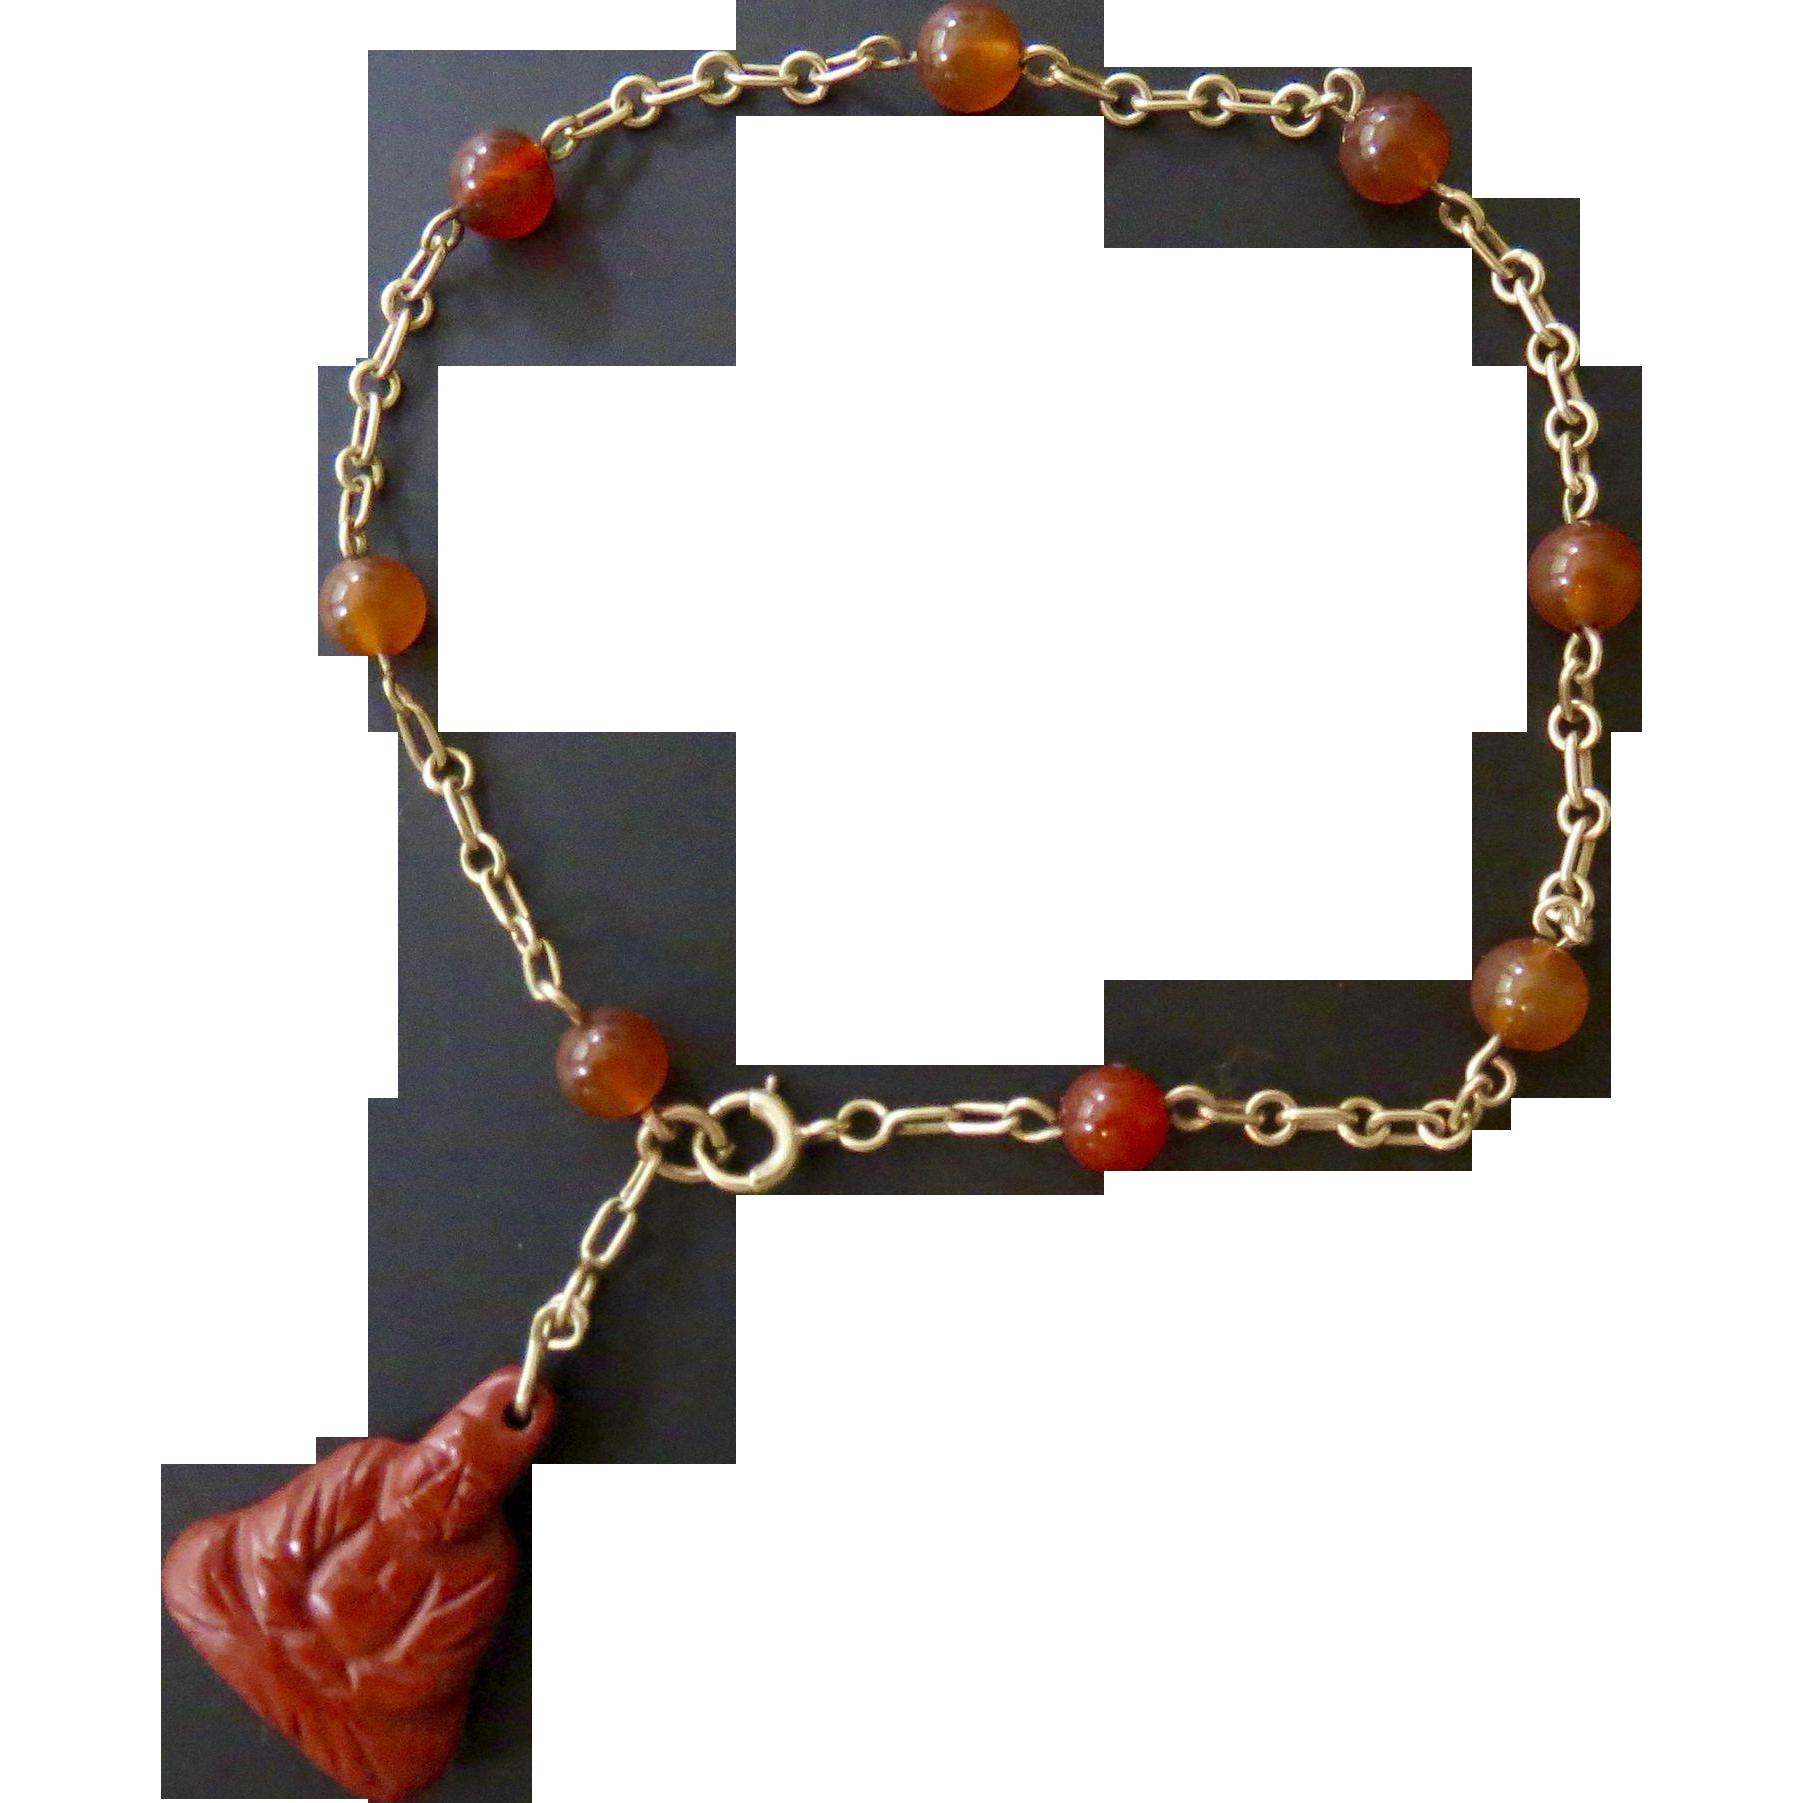 14k Gold Chinese Export Red Jade Buddha Charm Bracelet - Art Deco